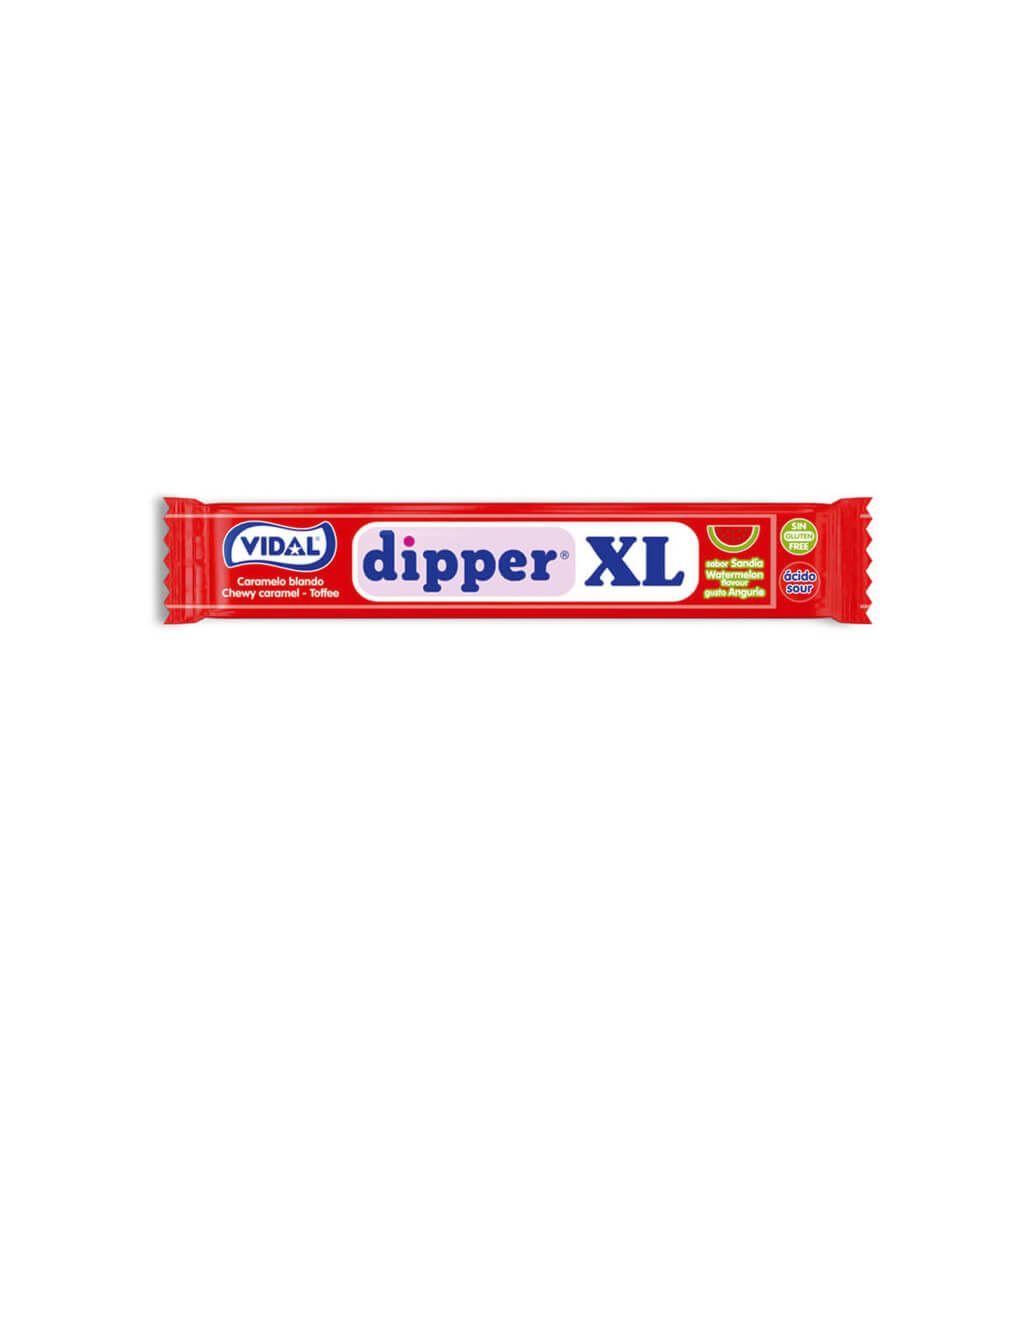 Dipper XL Sandía estuche 10 estuches de 157g